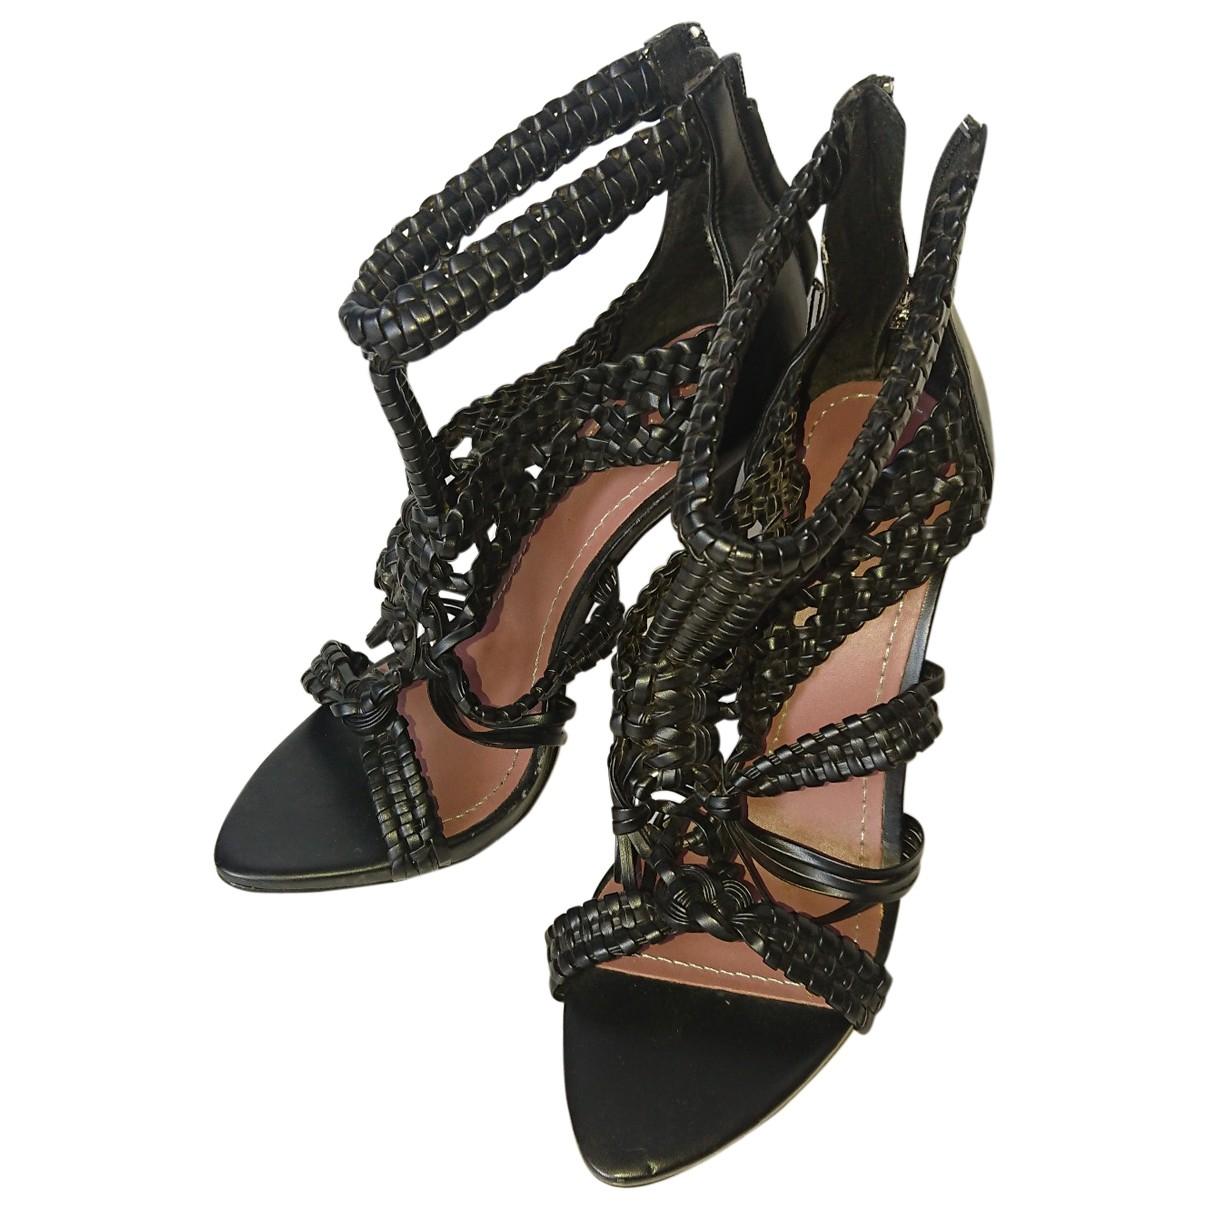 Zara \N Black Leather Sandals for Women 38 EU